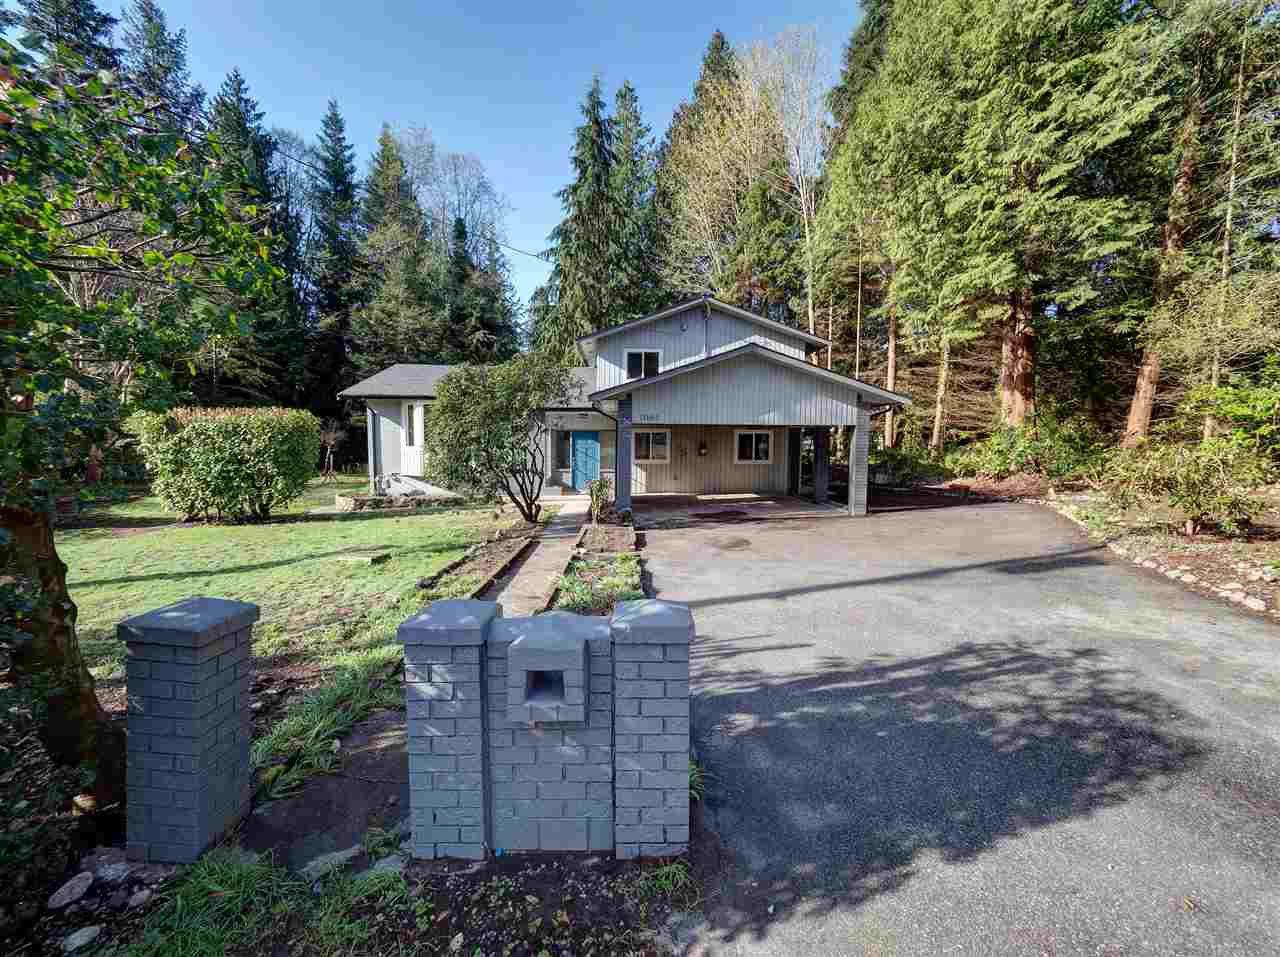 Photo 1: Photos: 1085 ROBERTS CREEK Road: Roberts Creek House for sale (Sunshine Coast)  : MLS®# R2392415